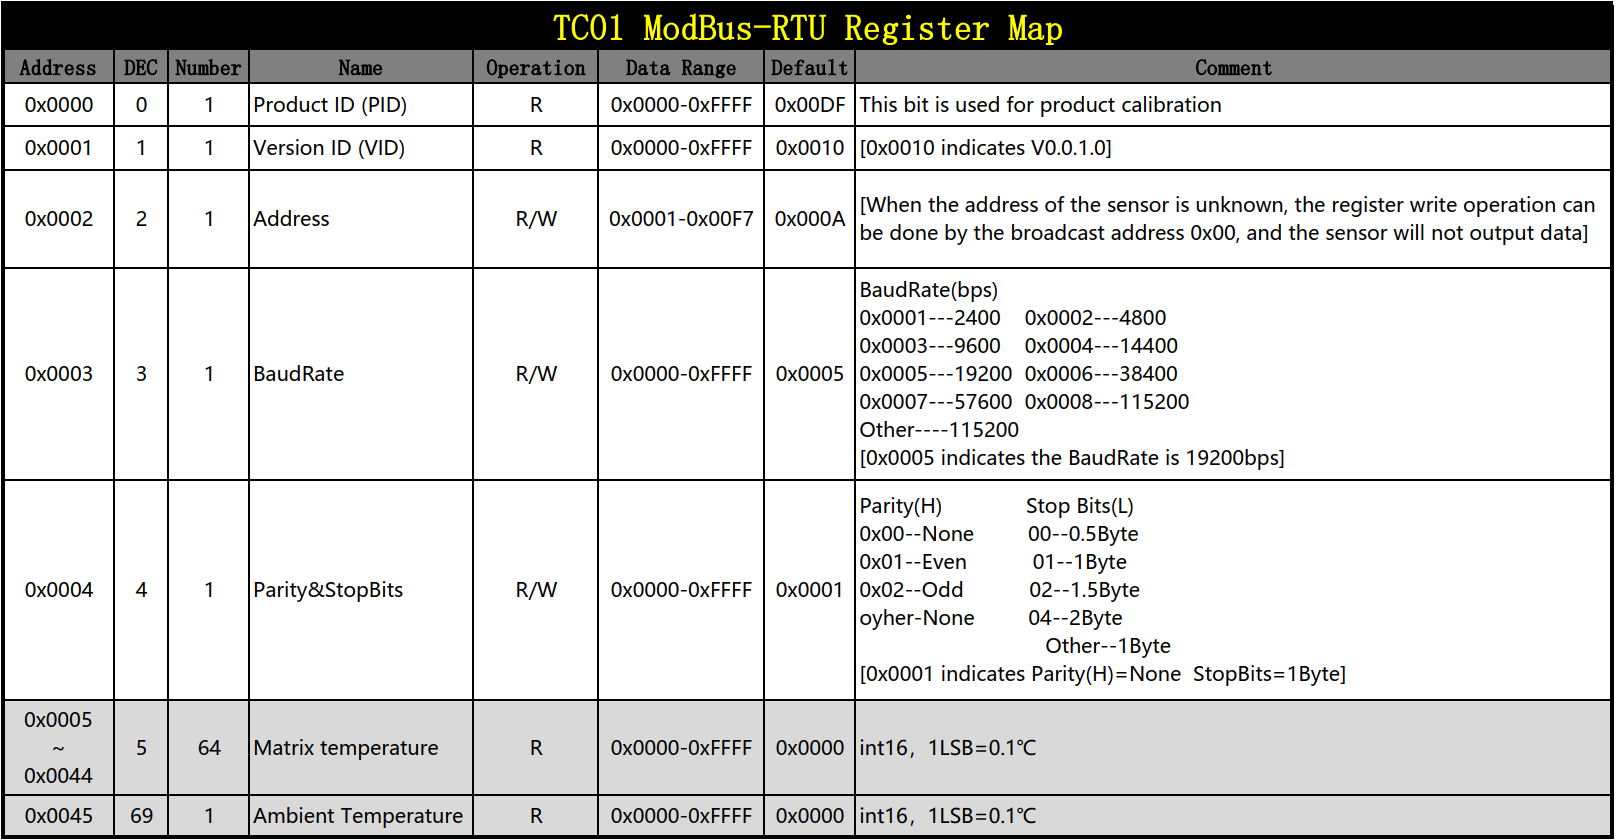 SEN0254-RegisterMap-EN-20052101